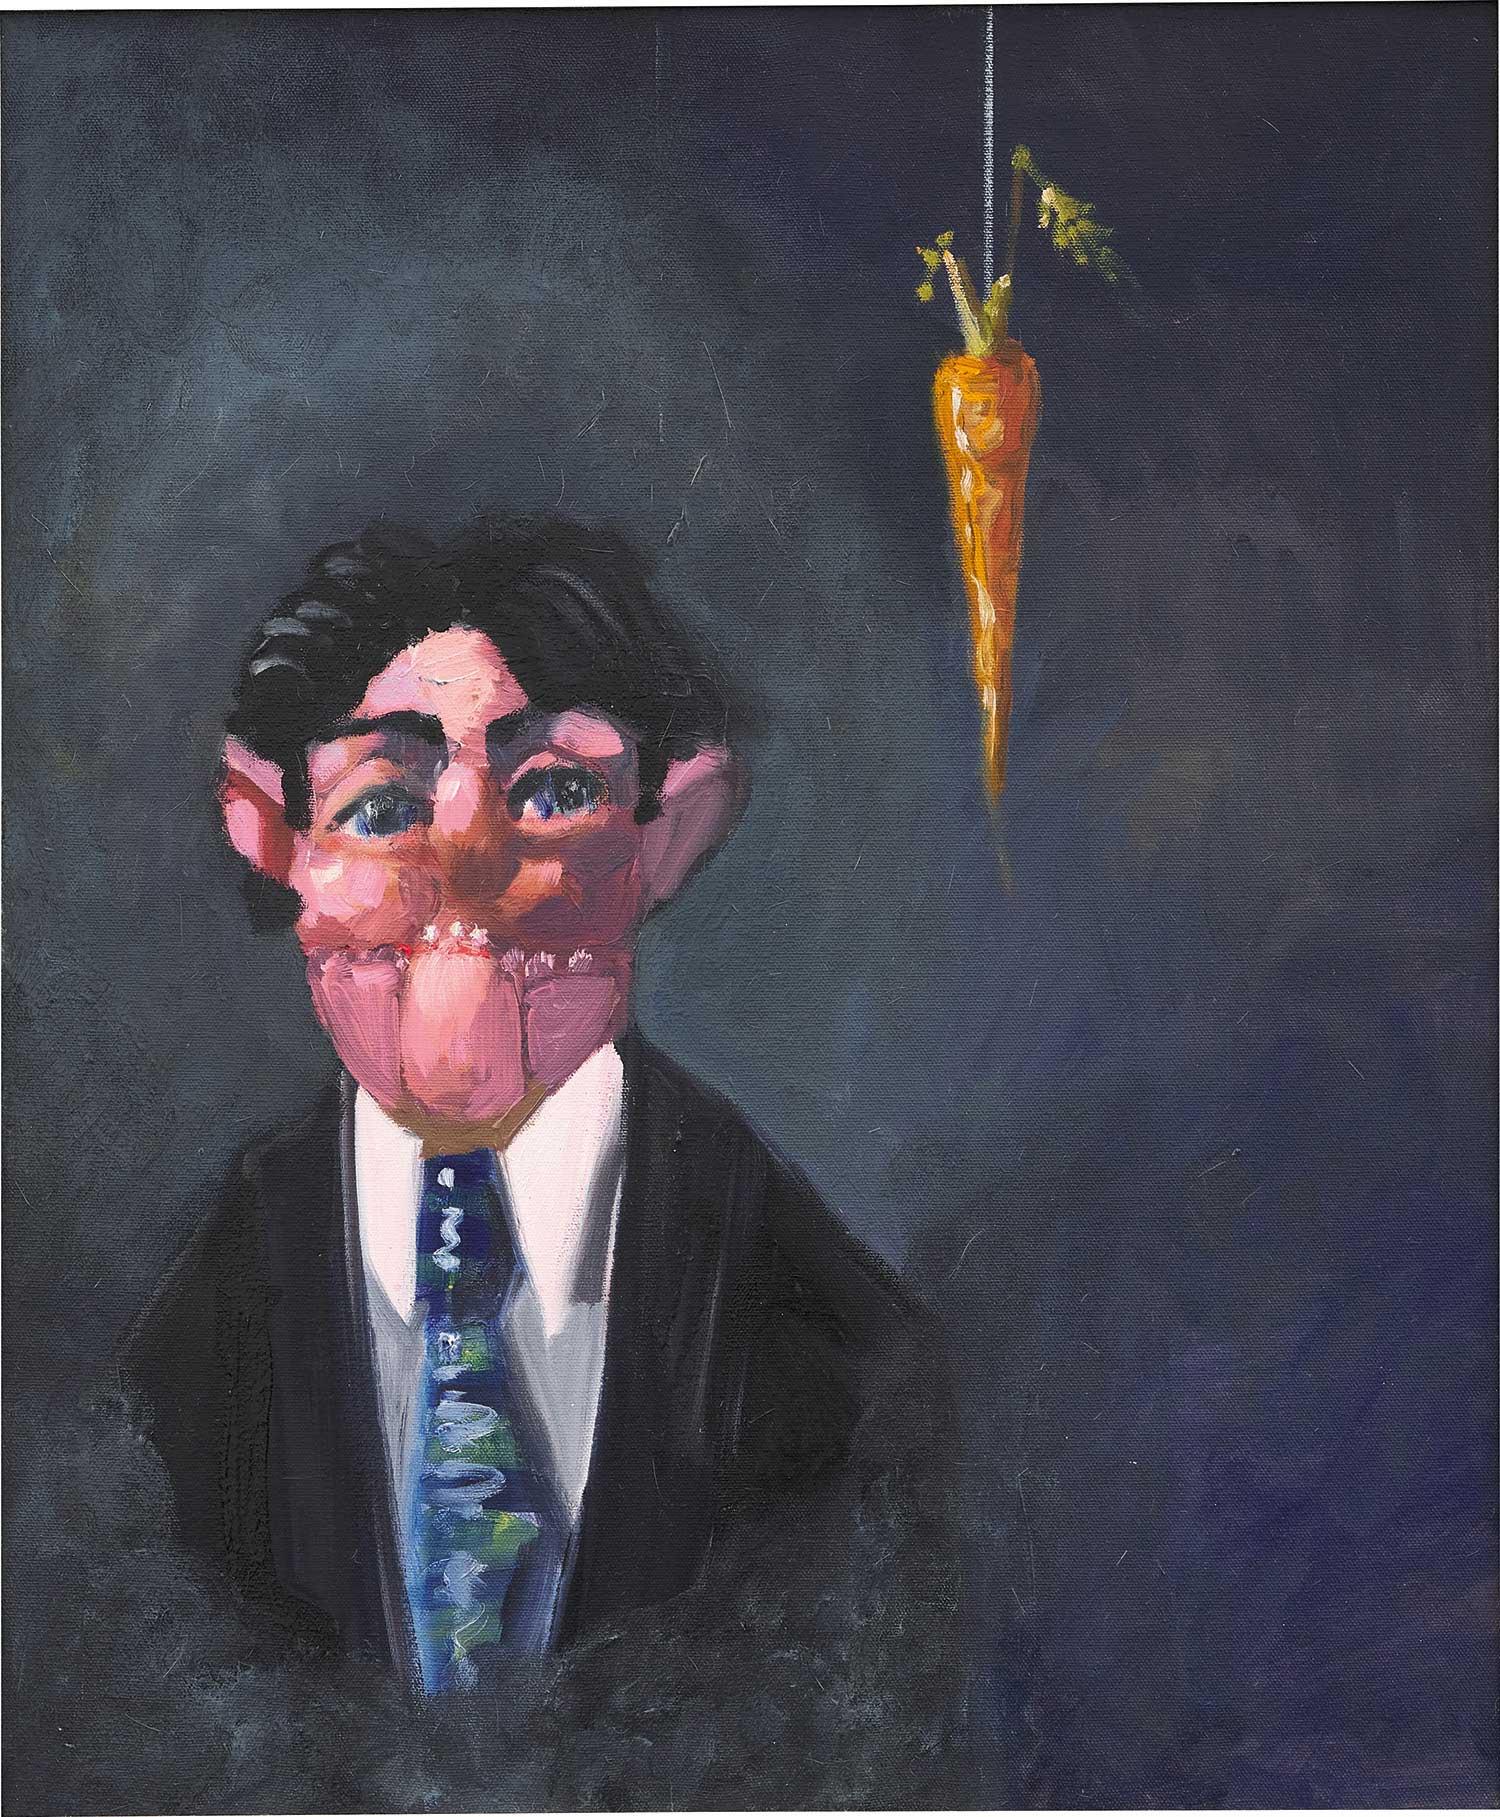 194_George-Condo,-The-Executive,-2003.jpg